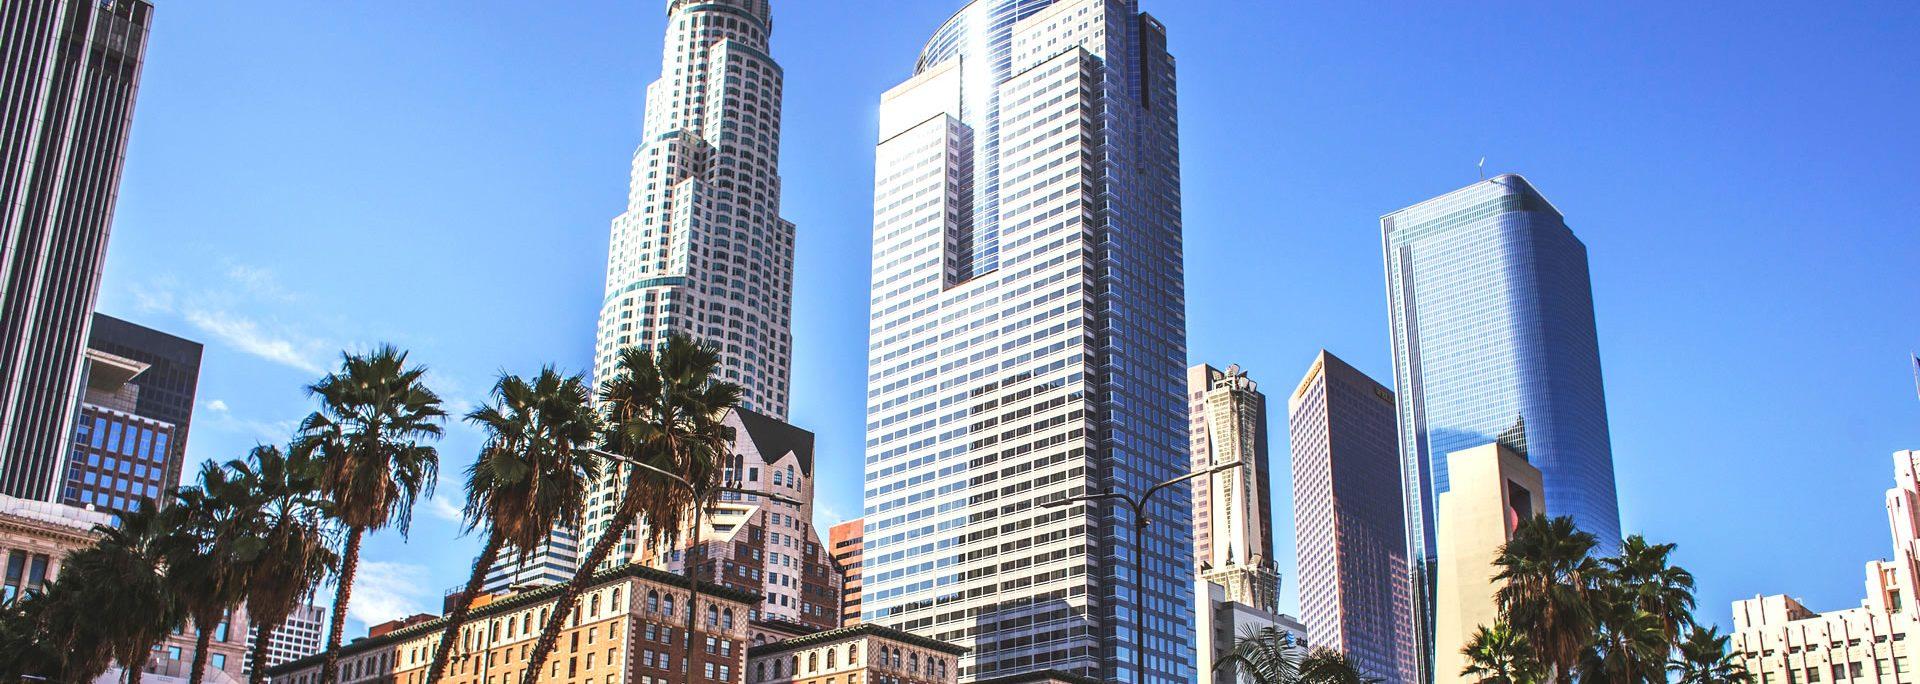 Property Insurance Kenya